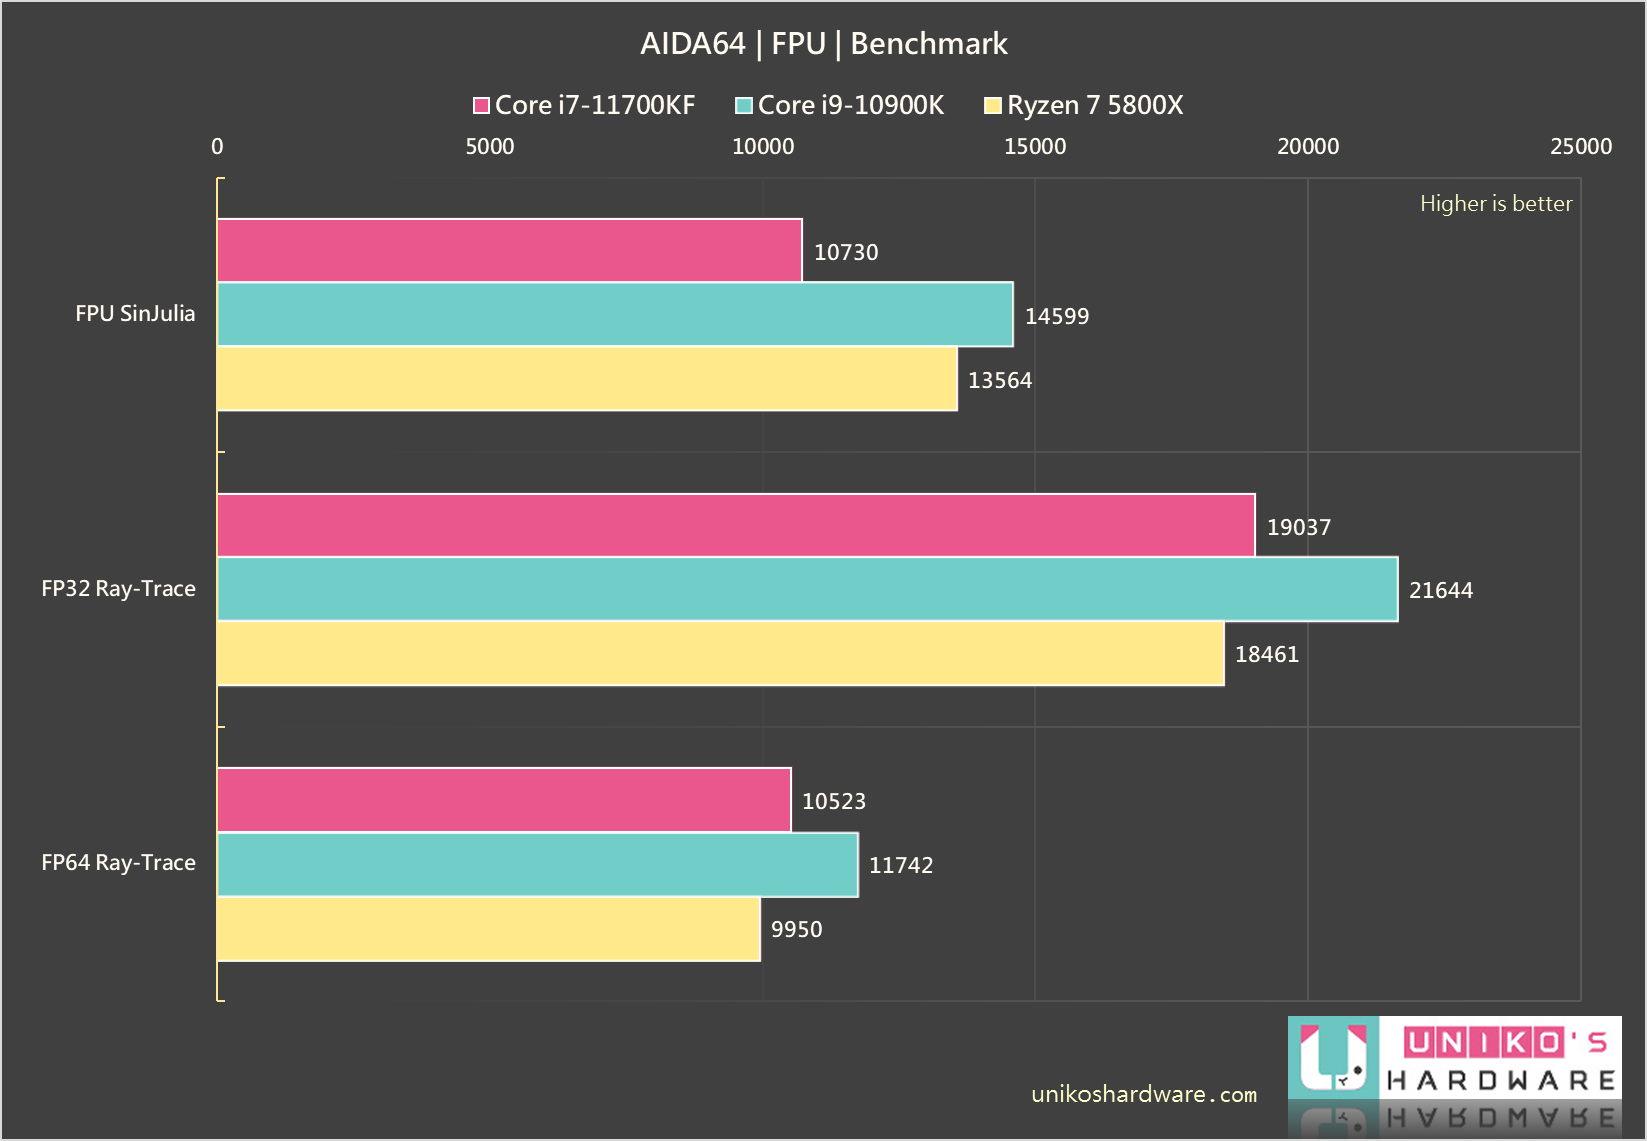 FPU SinJulia、FP32 Ray-Trace、FP64 Ray-Trace。